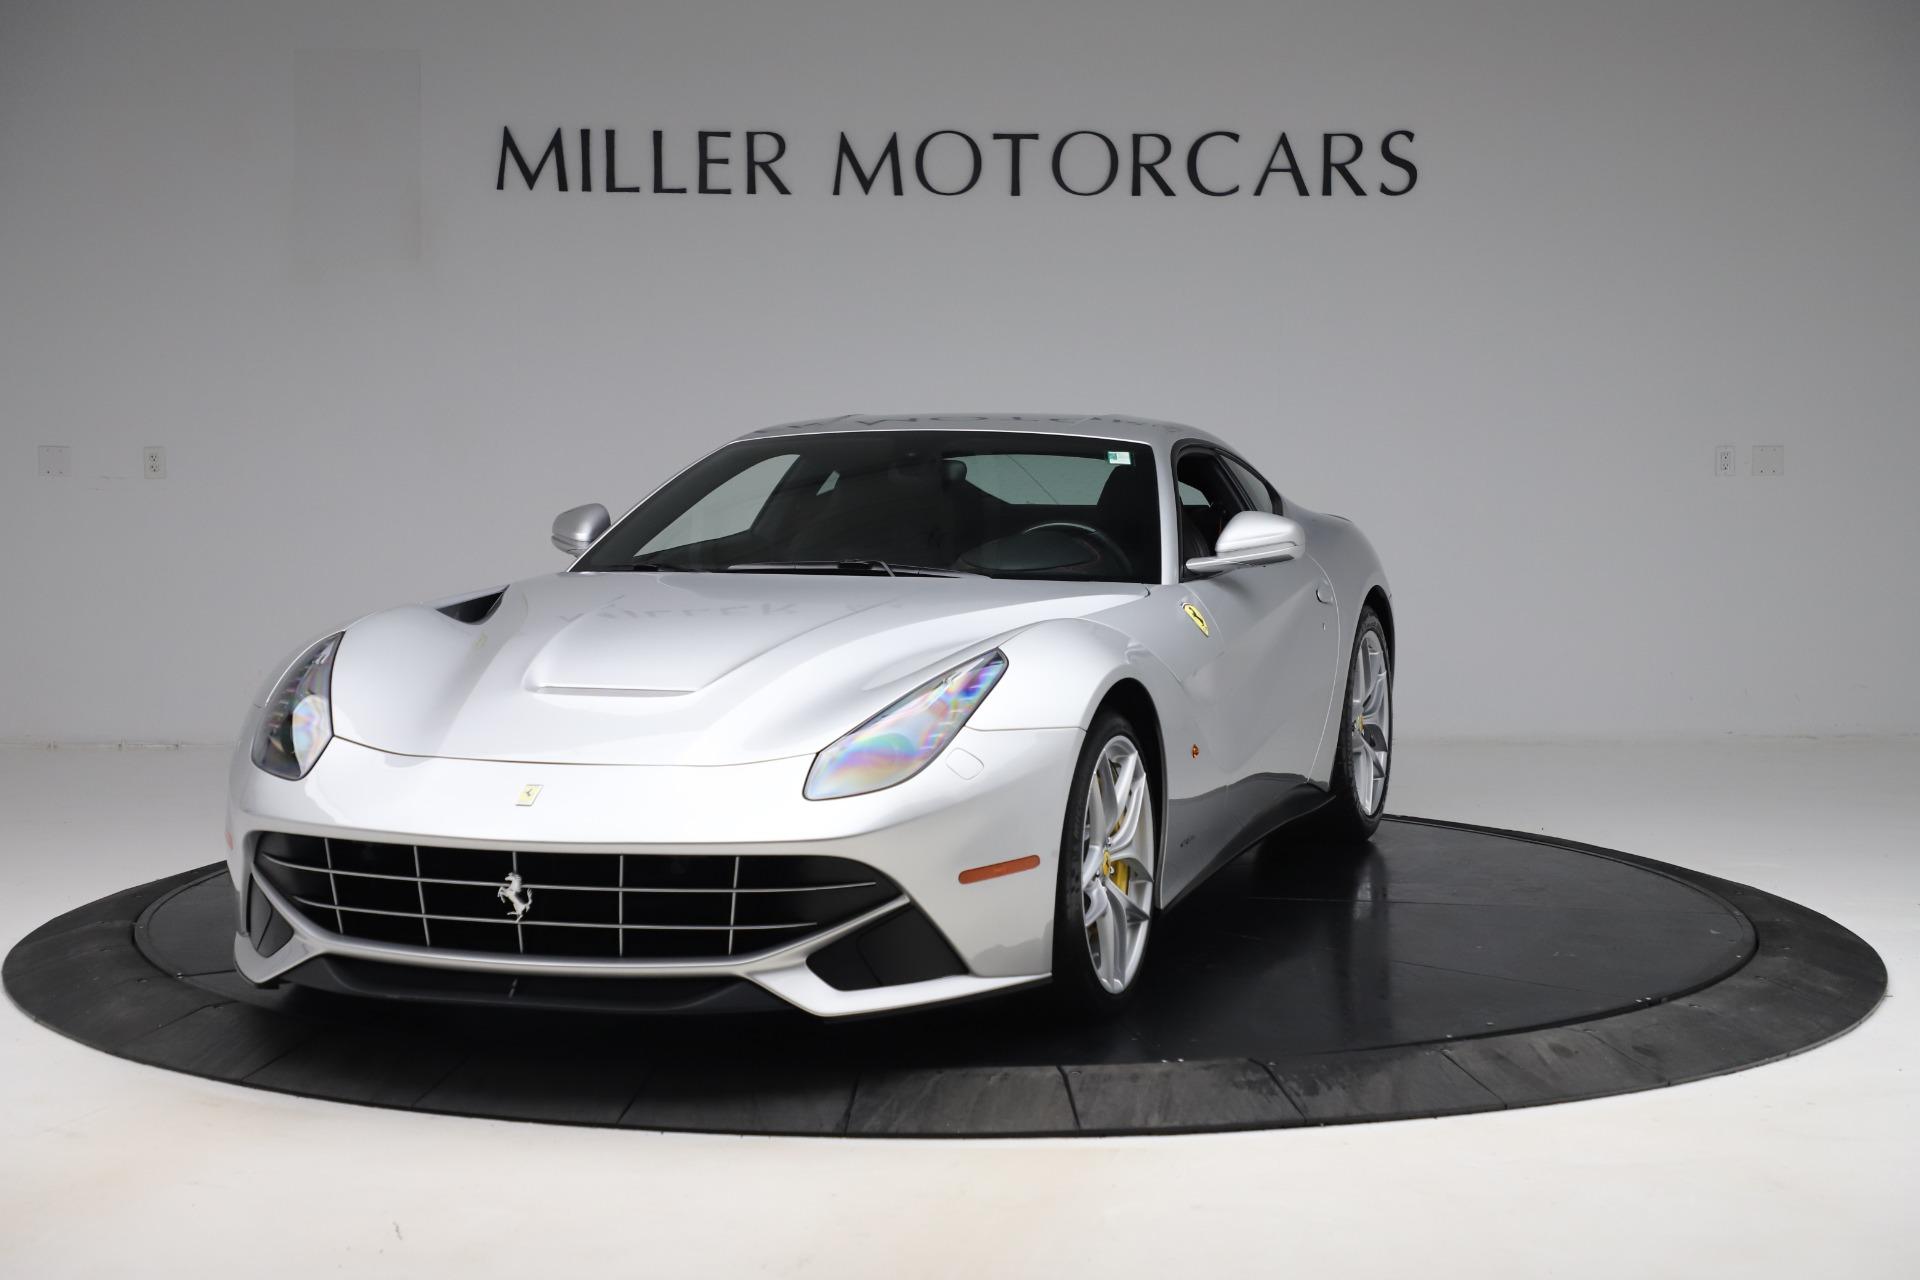 Used 2015 Ferrari F12 Berlinetta for sale $235,900 at Rolls-Royce Motor Cars Greenwich in Greenwich CT 06830 1